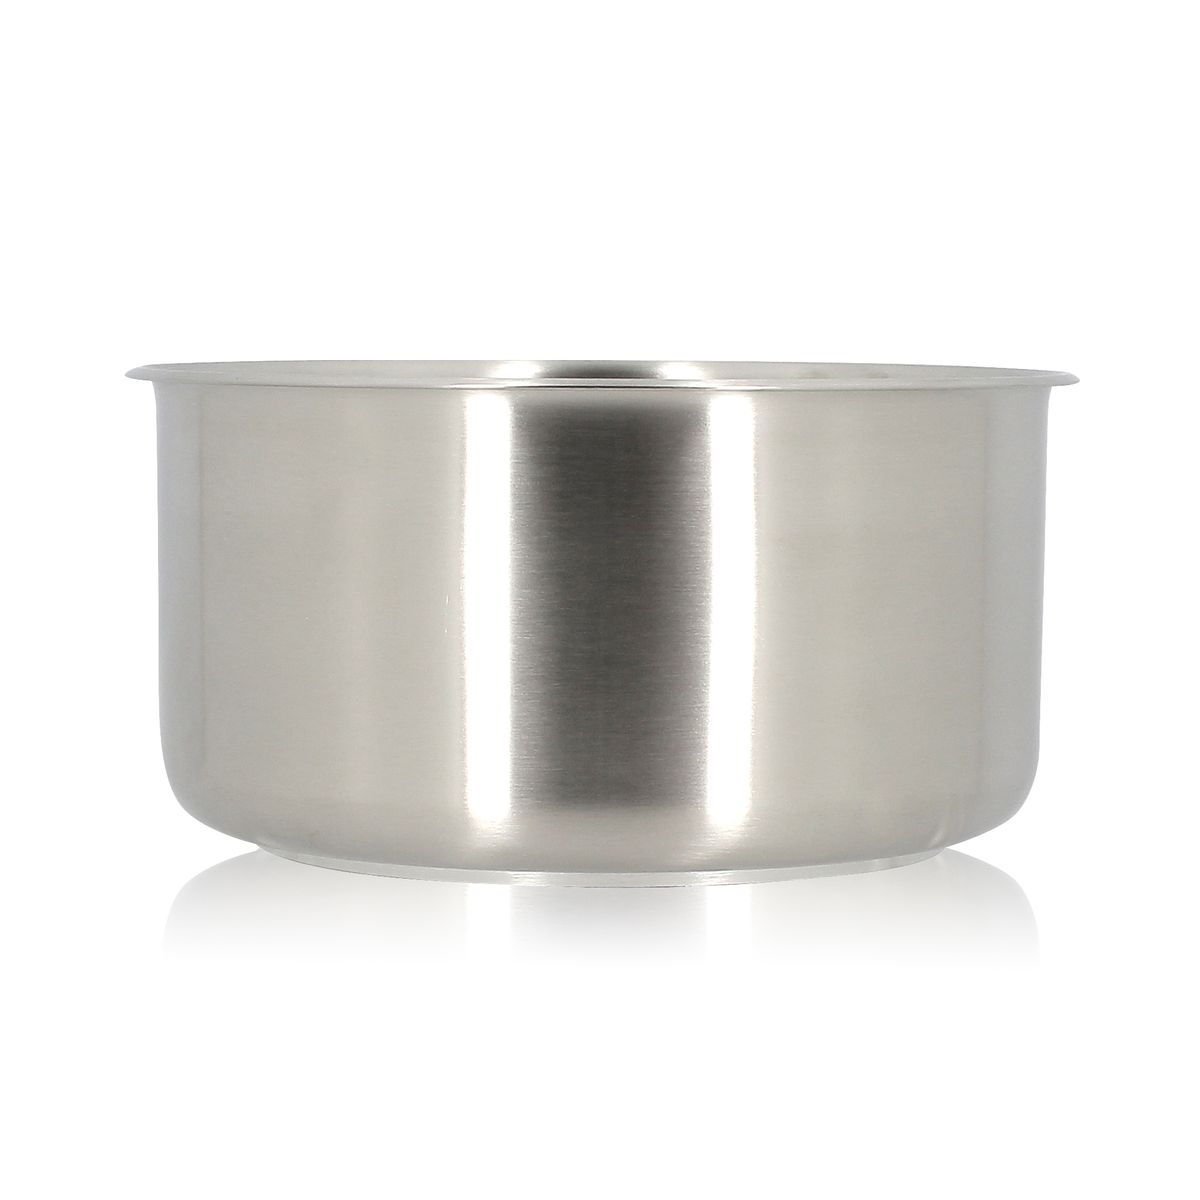 Casserole amovible en inox et induction 18 cm